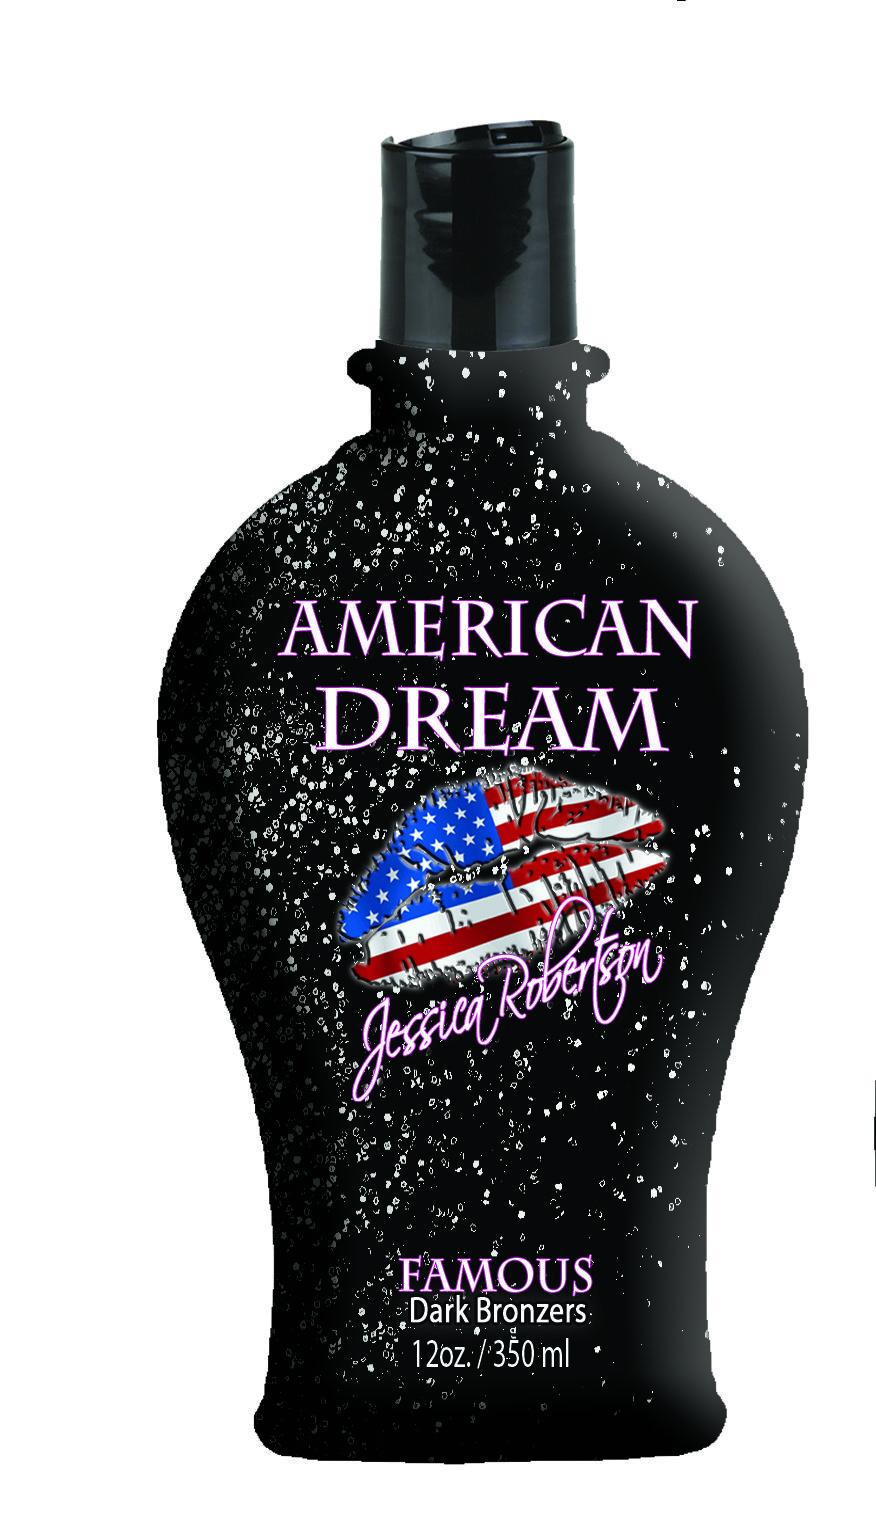 Jessica Robertson American Dream Ultra Dark Bronzing